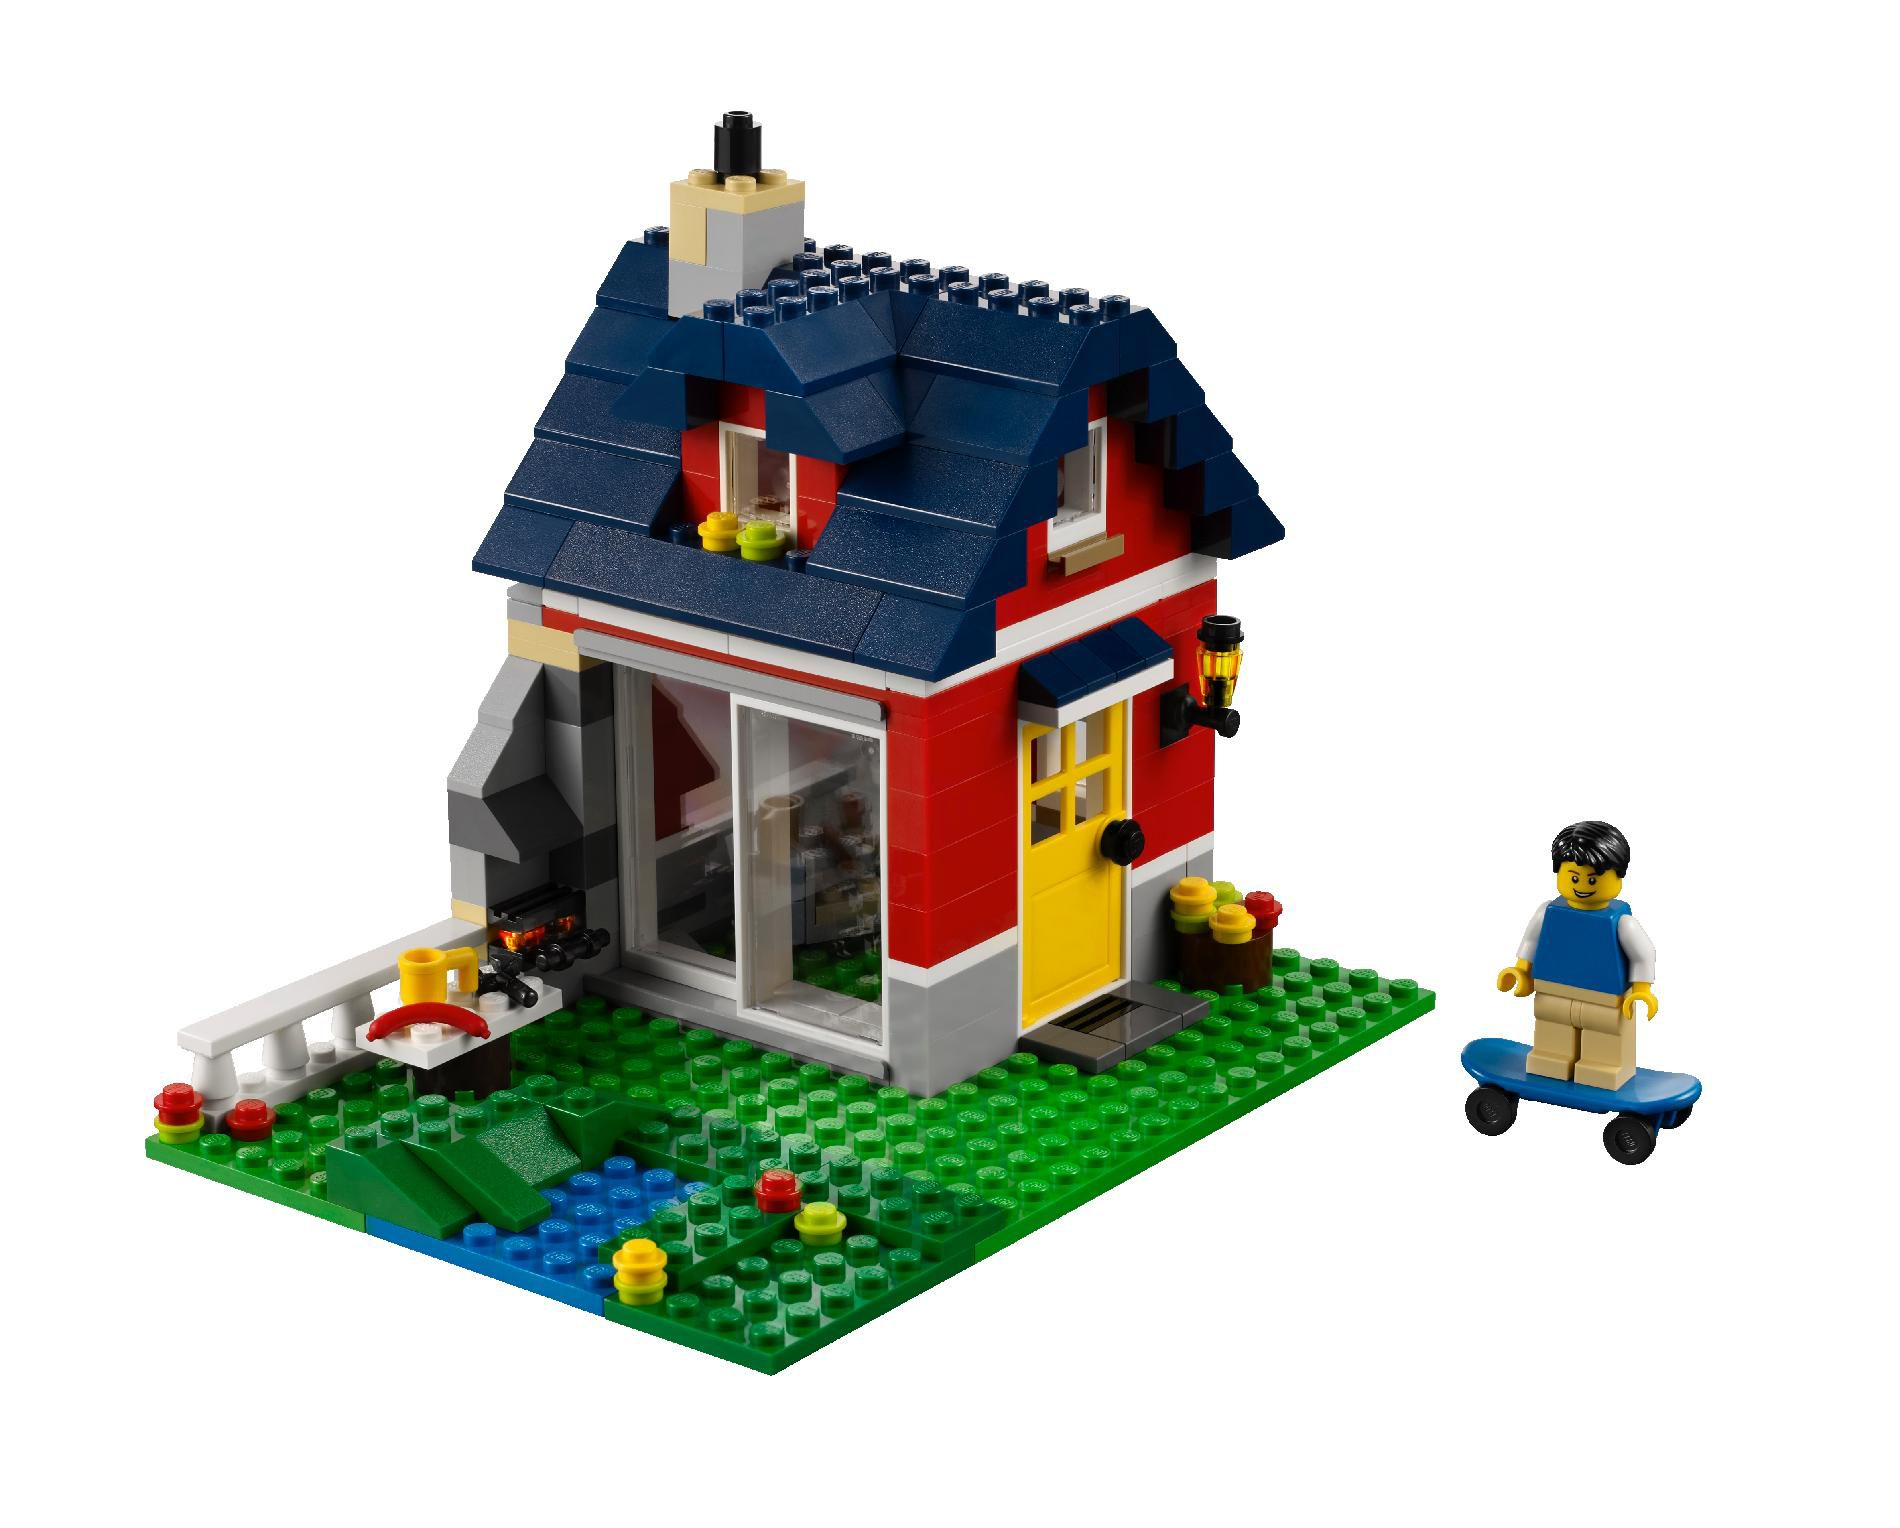 Lego Creator Small Cottage 31009 Toys Games Blocks